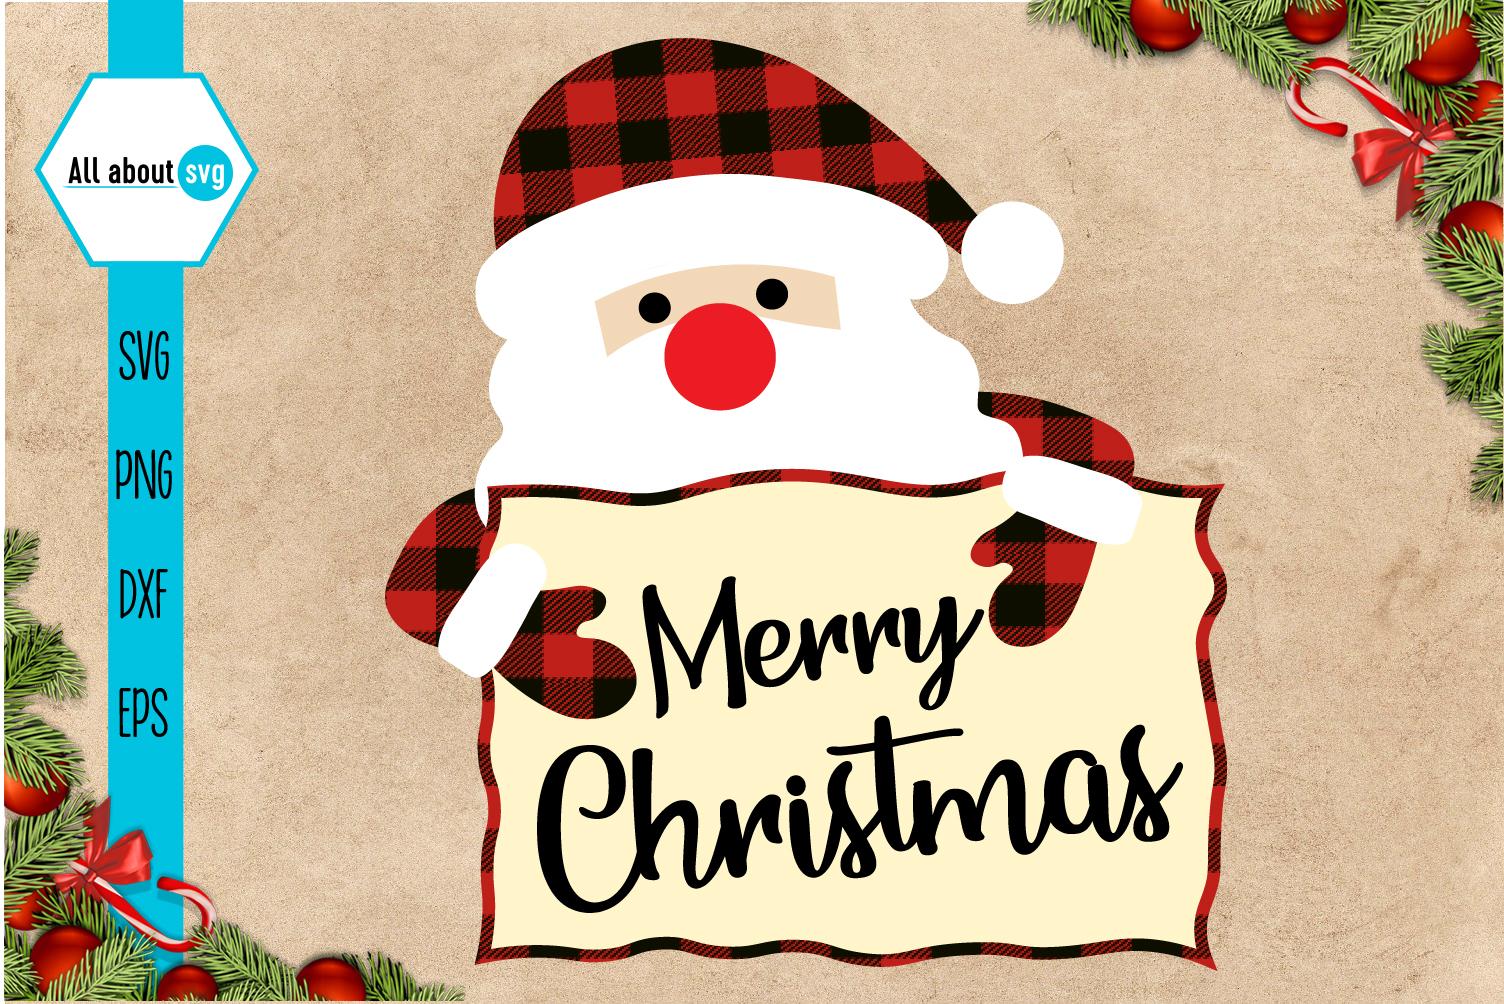 Merry Christmas Svg, Santa Claus Buffalo Plaid Svg example image 1